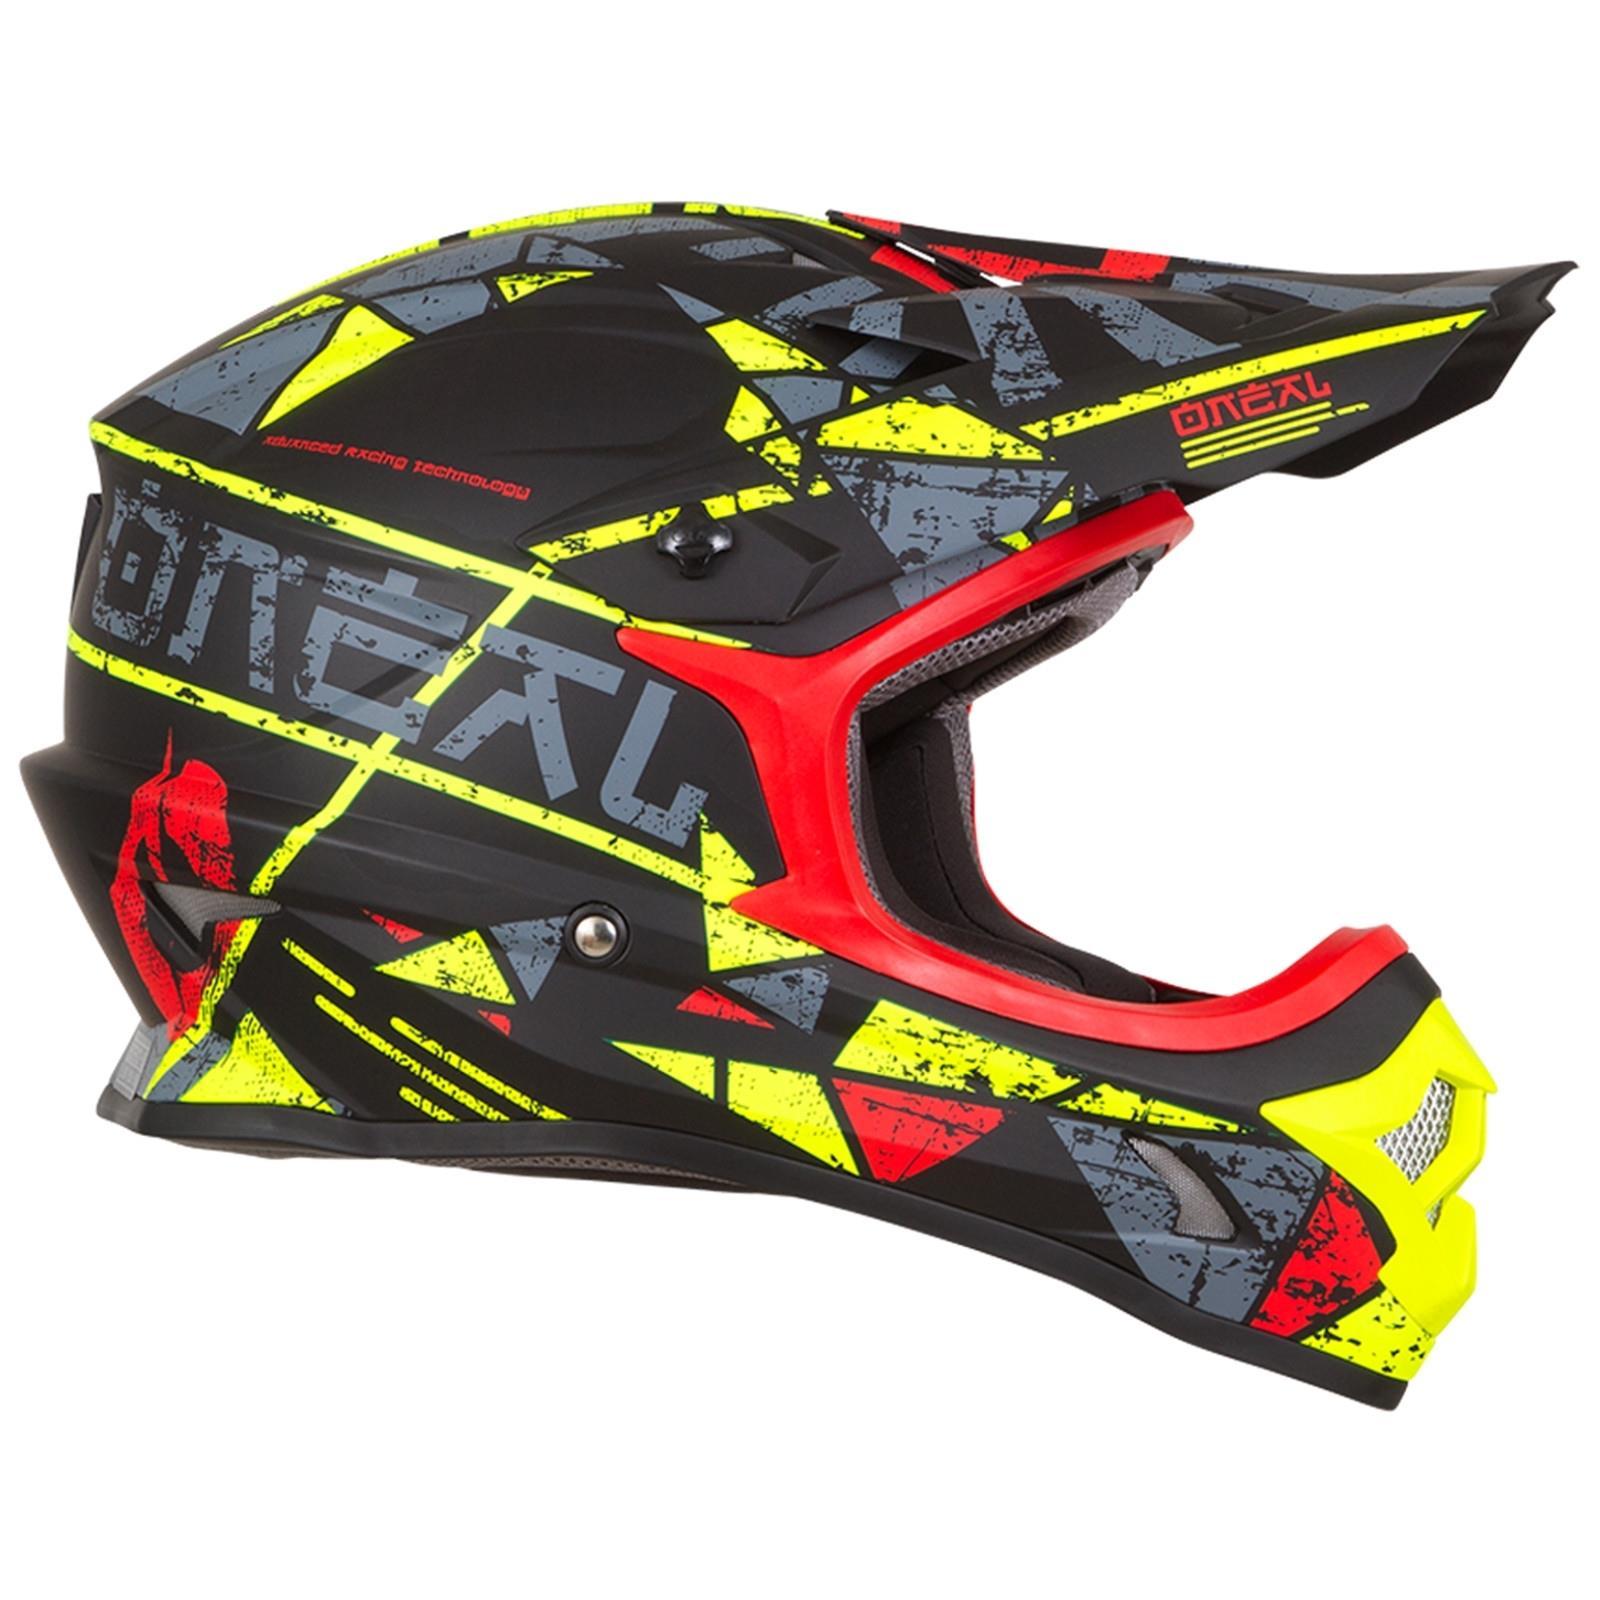 ONeal-Motocross-casco-MX-ENDURO-MOTO-BICI-FUORISTRADA-CROSS-Series-Adventure miniatura 29